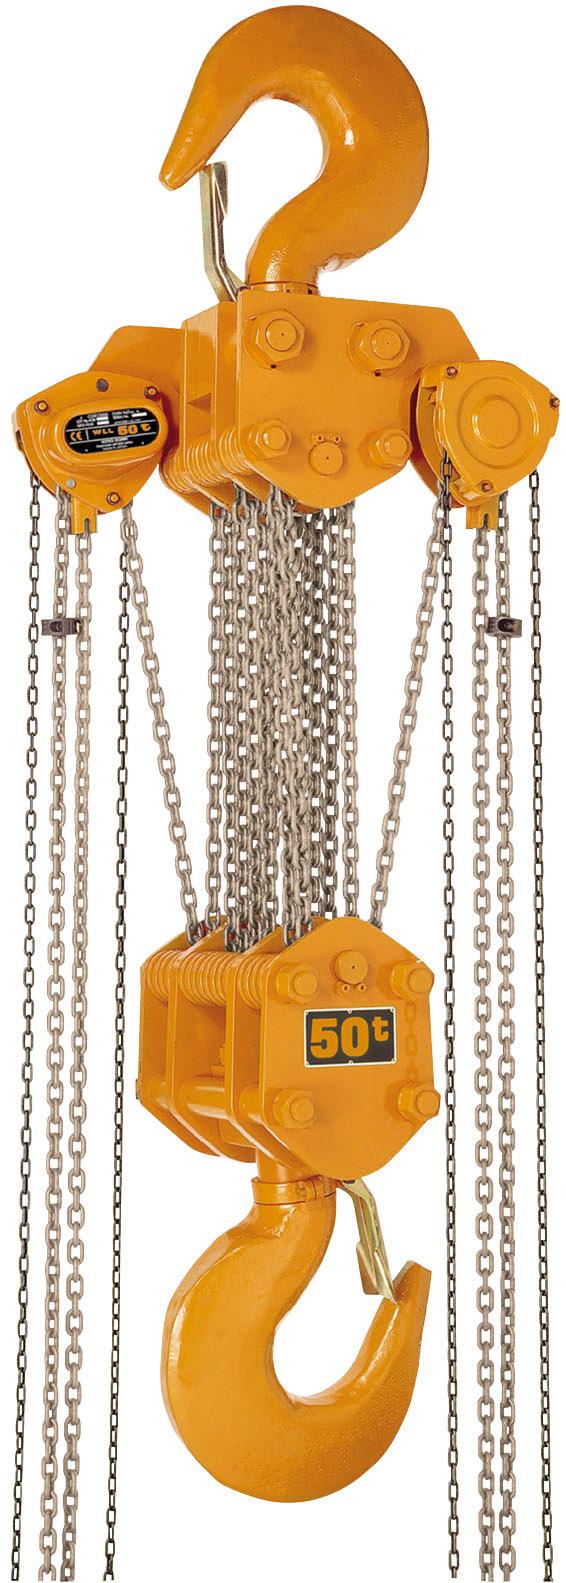 Cb 50t2